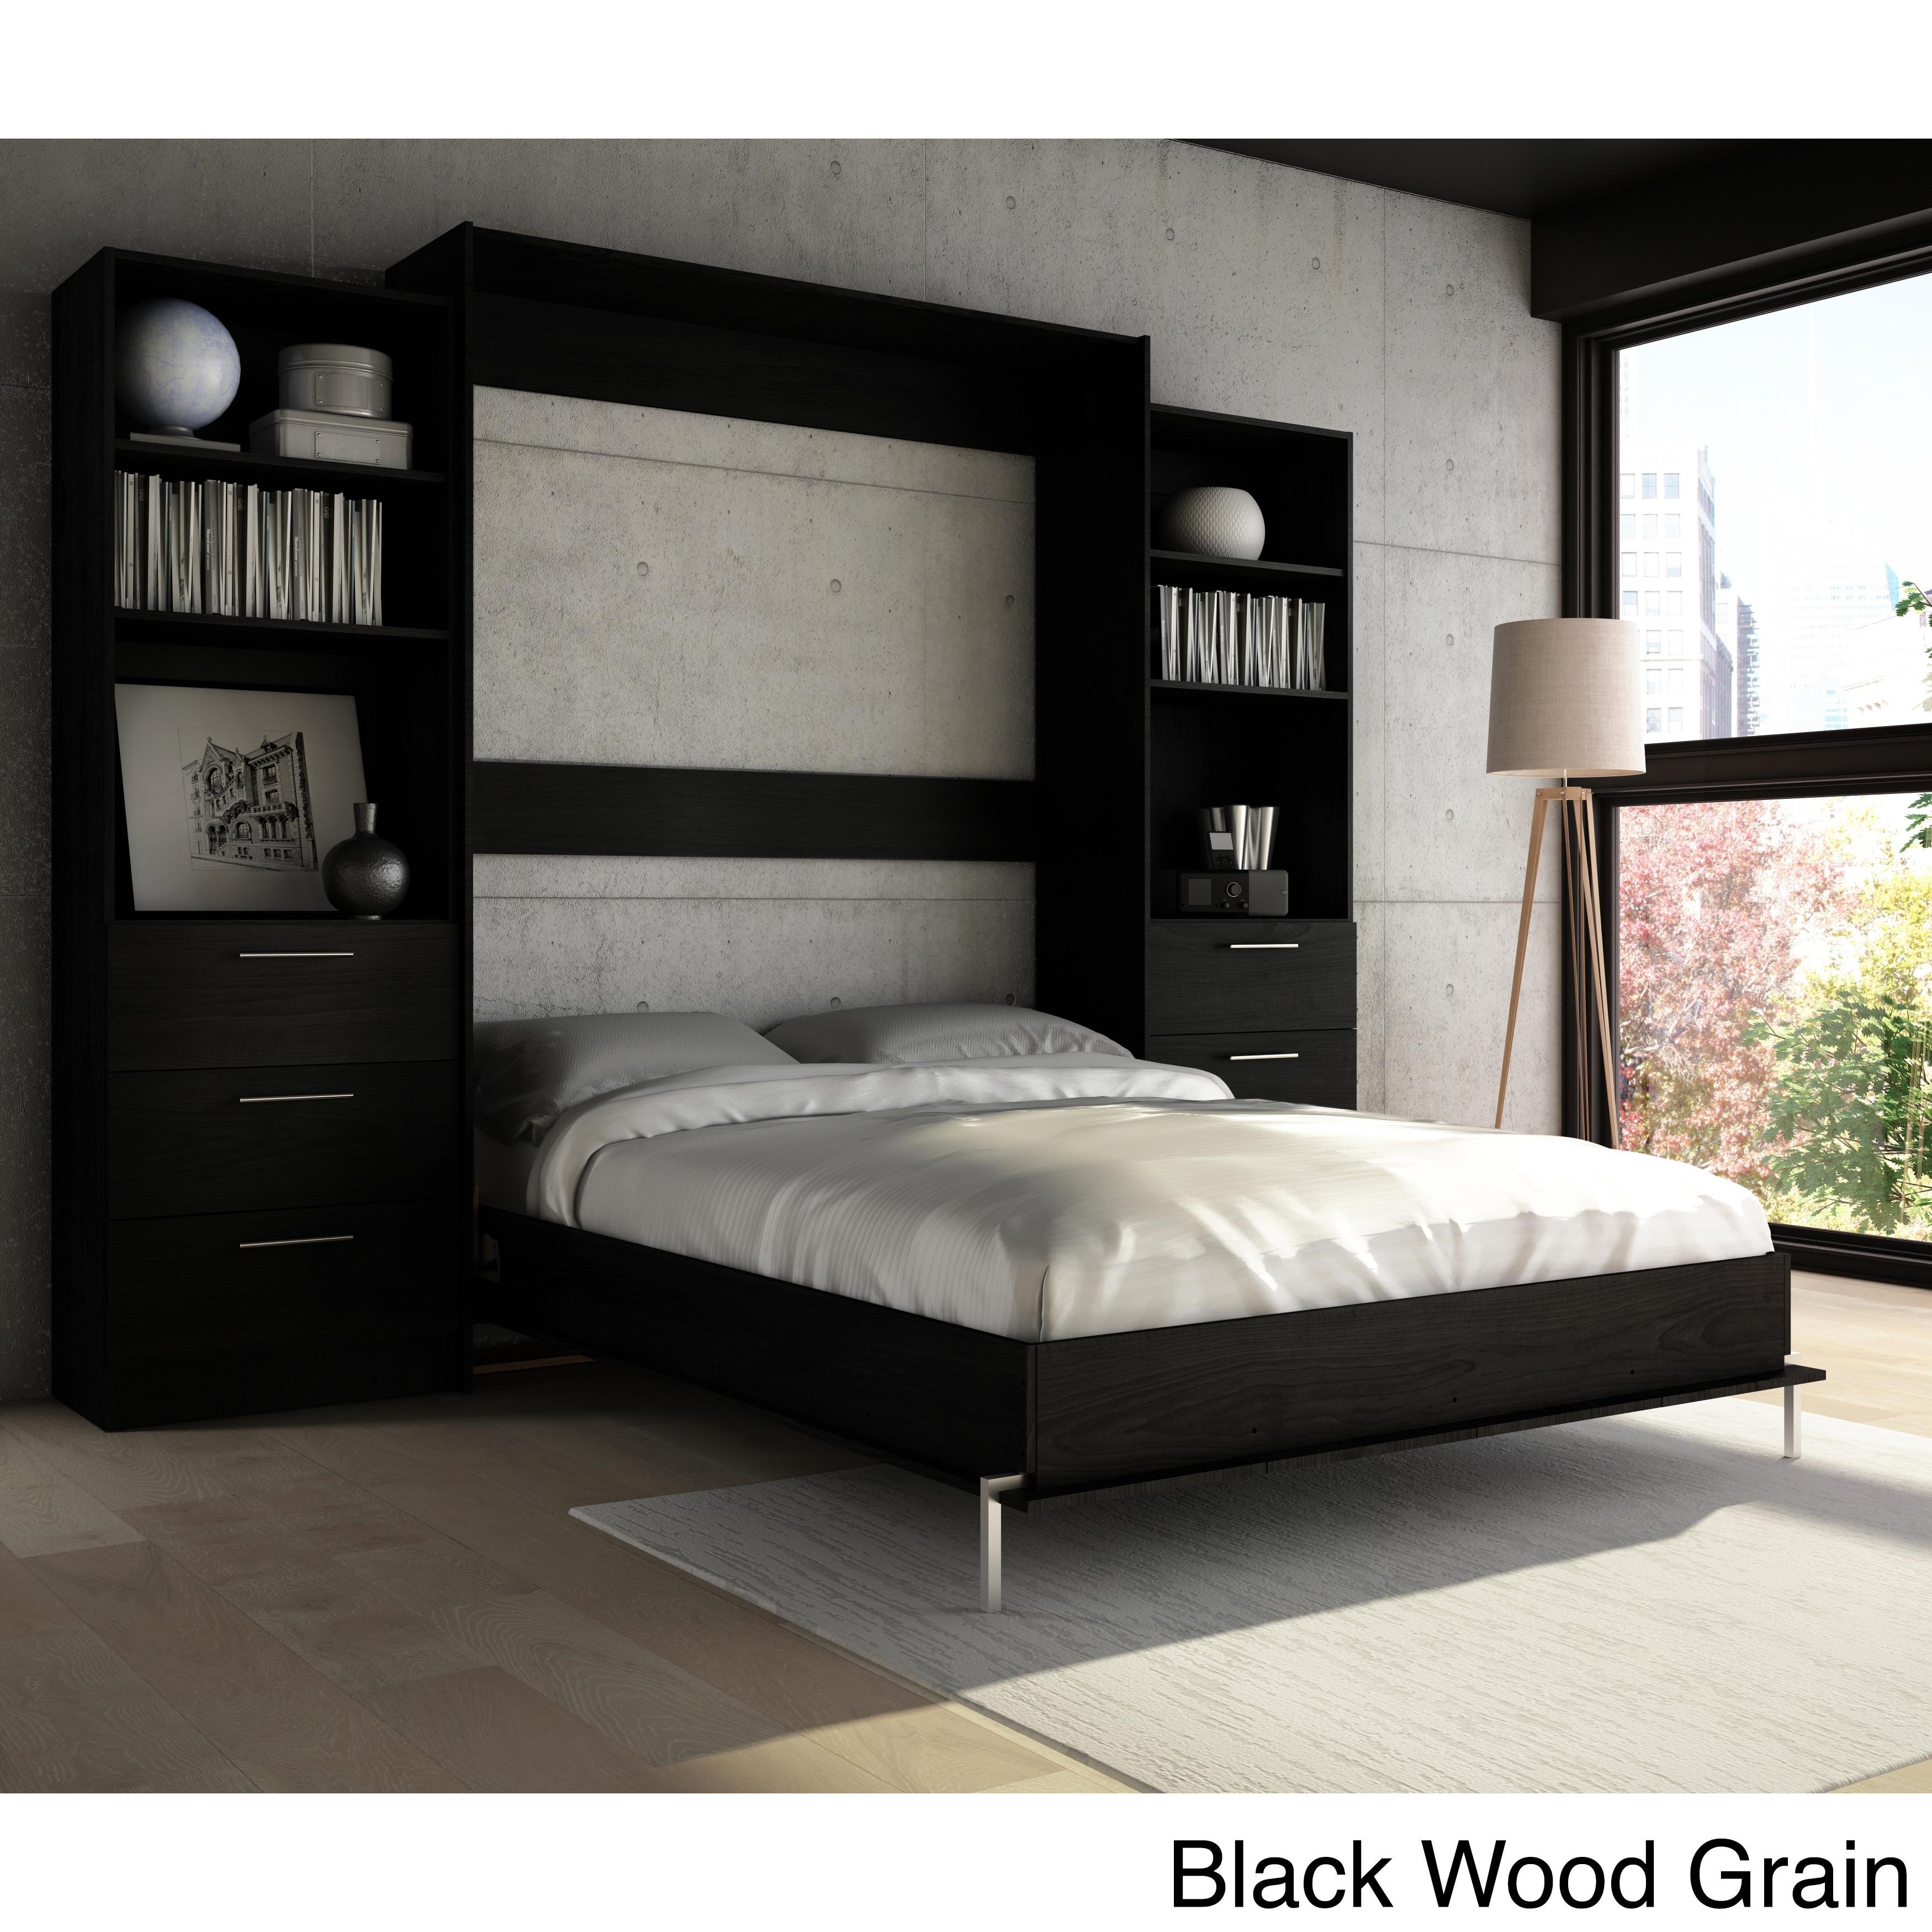 Stellar Home Furniture Queen Wall Bed (Black Wood Grain)